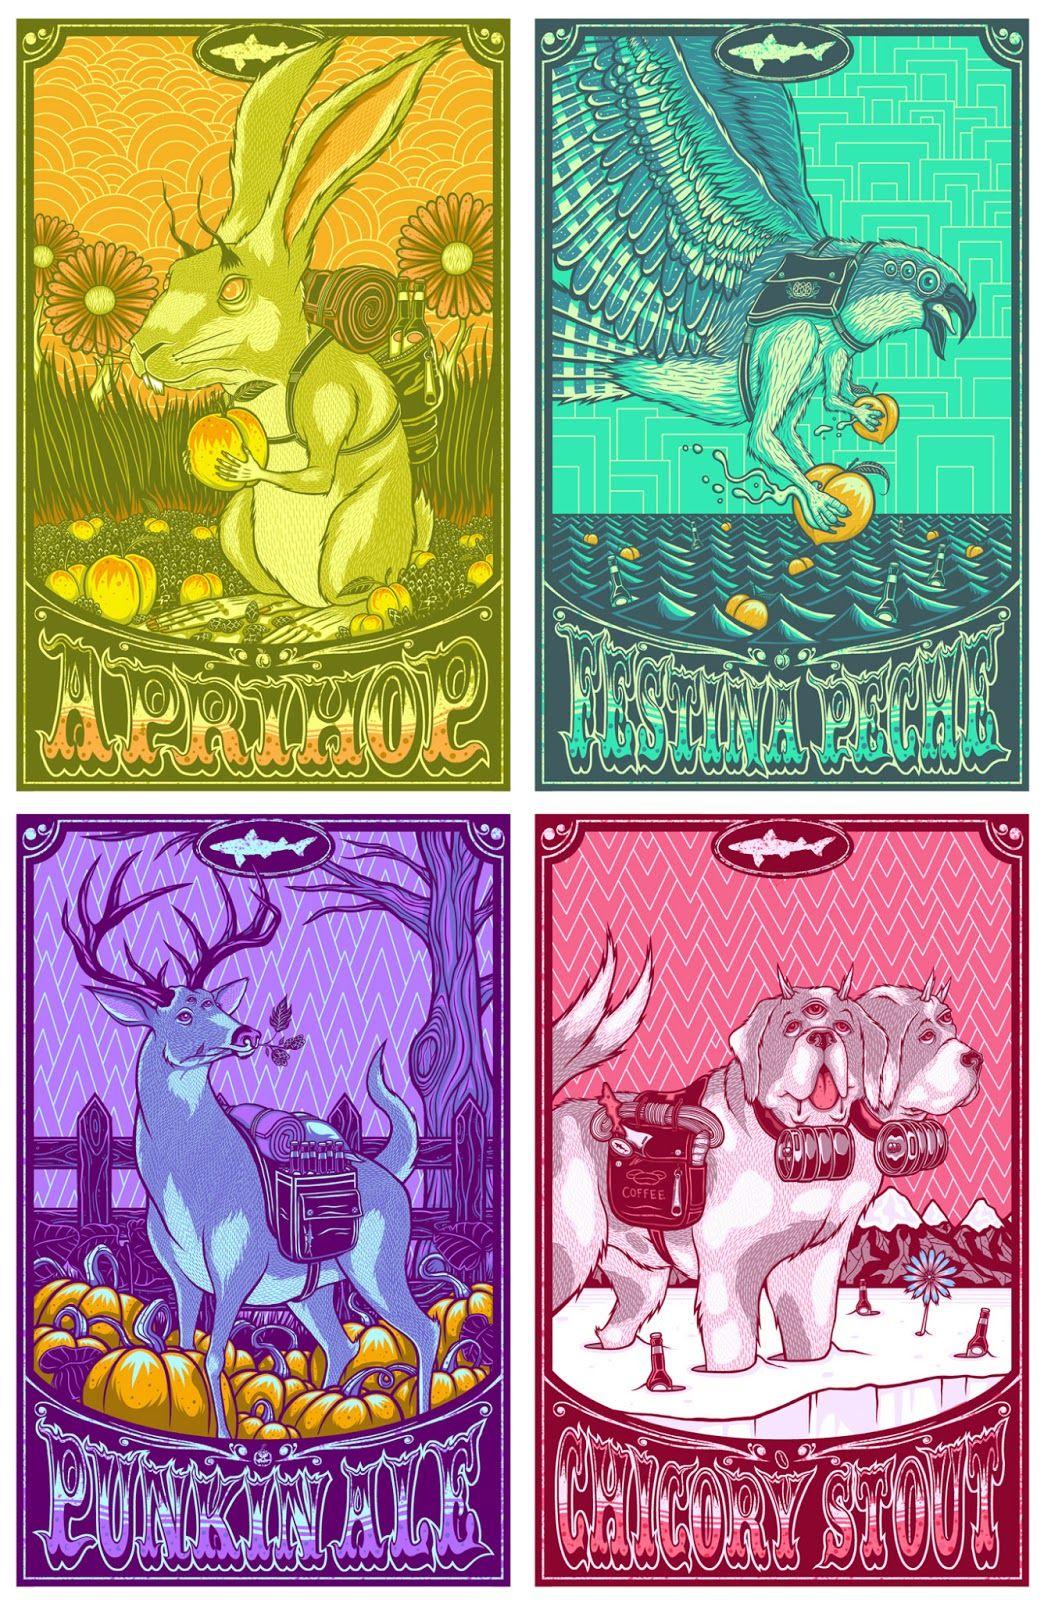 INSIDE THE ROCK POSTER FRAME BLOG: Jim Mazza Dogfish Head 2013 Artist Prints Release